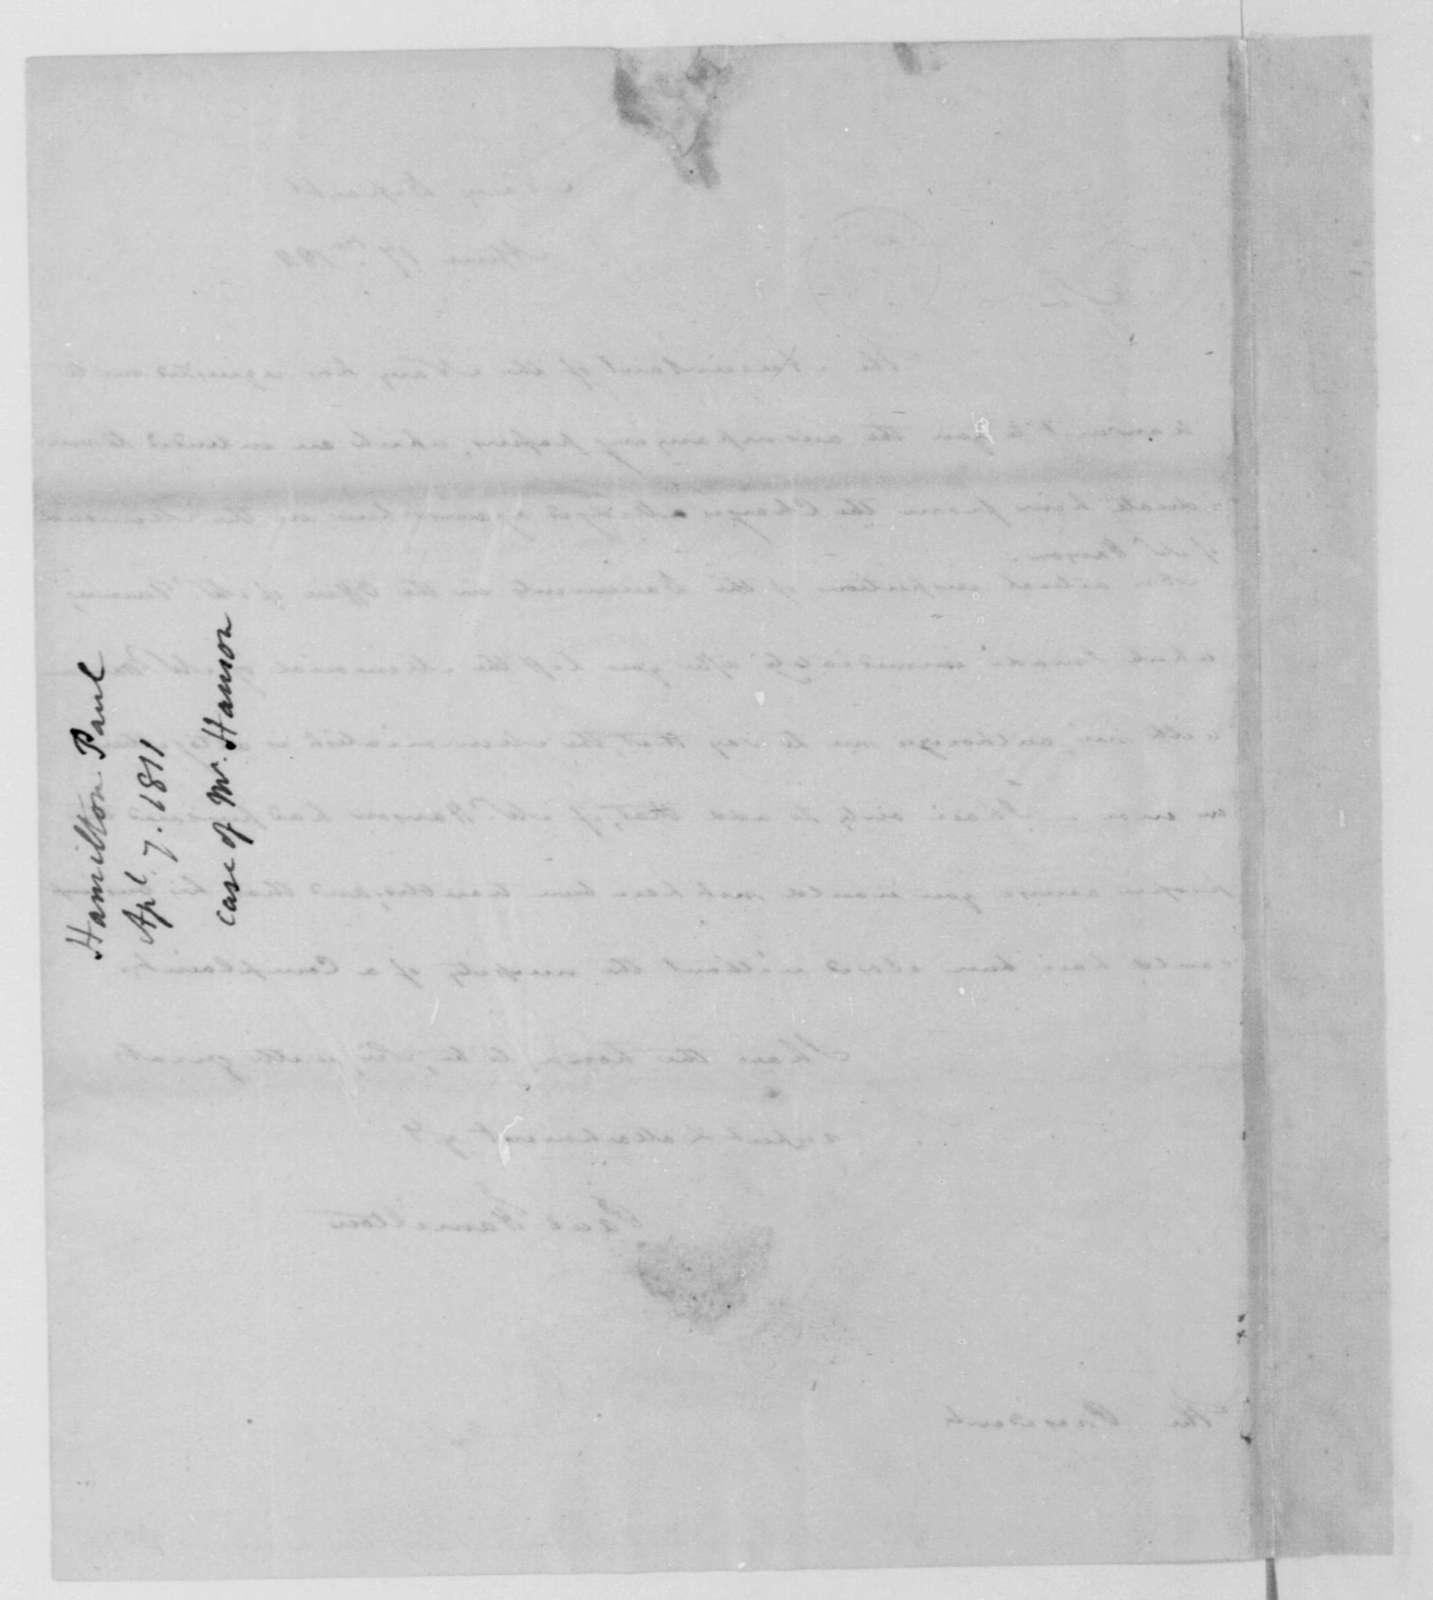 Paul Hamilton to James Madison, April 17, 1811.